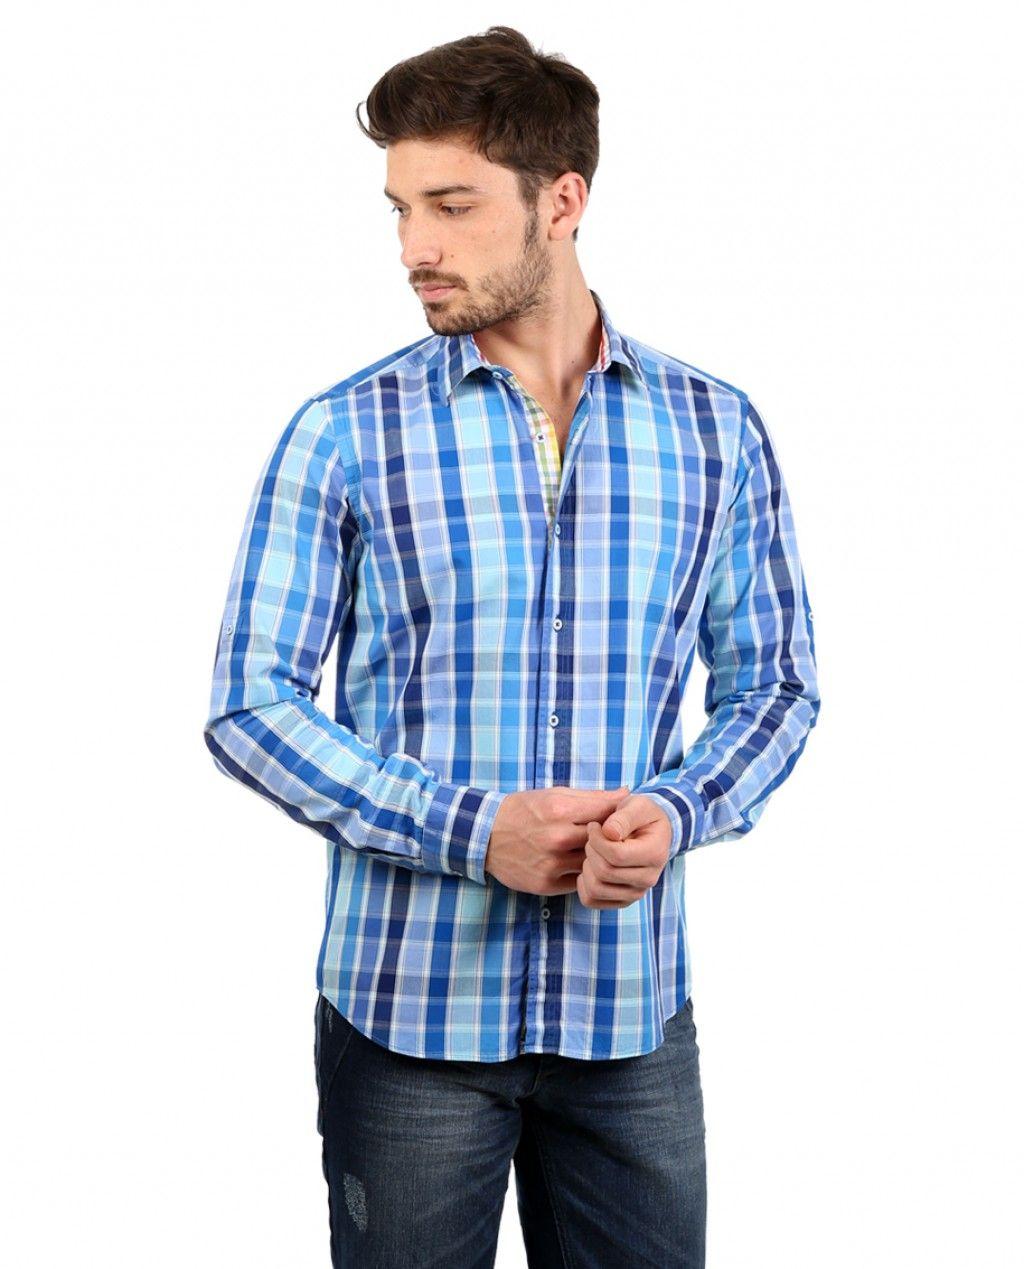 8792d9ab2232e Toss Erkek Gömlek - Mavi #mensfashion #shirt #gomlek #karaca  #ciftgeyikkaraca #toss www.karaca.com.tr www.toss.com.tr